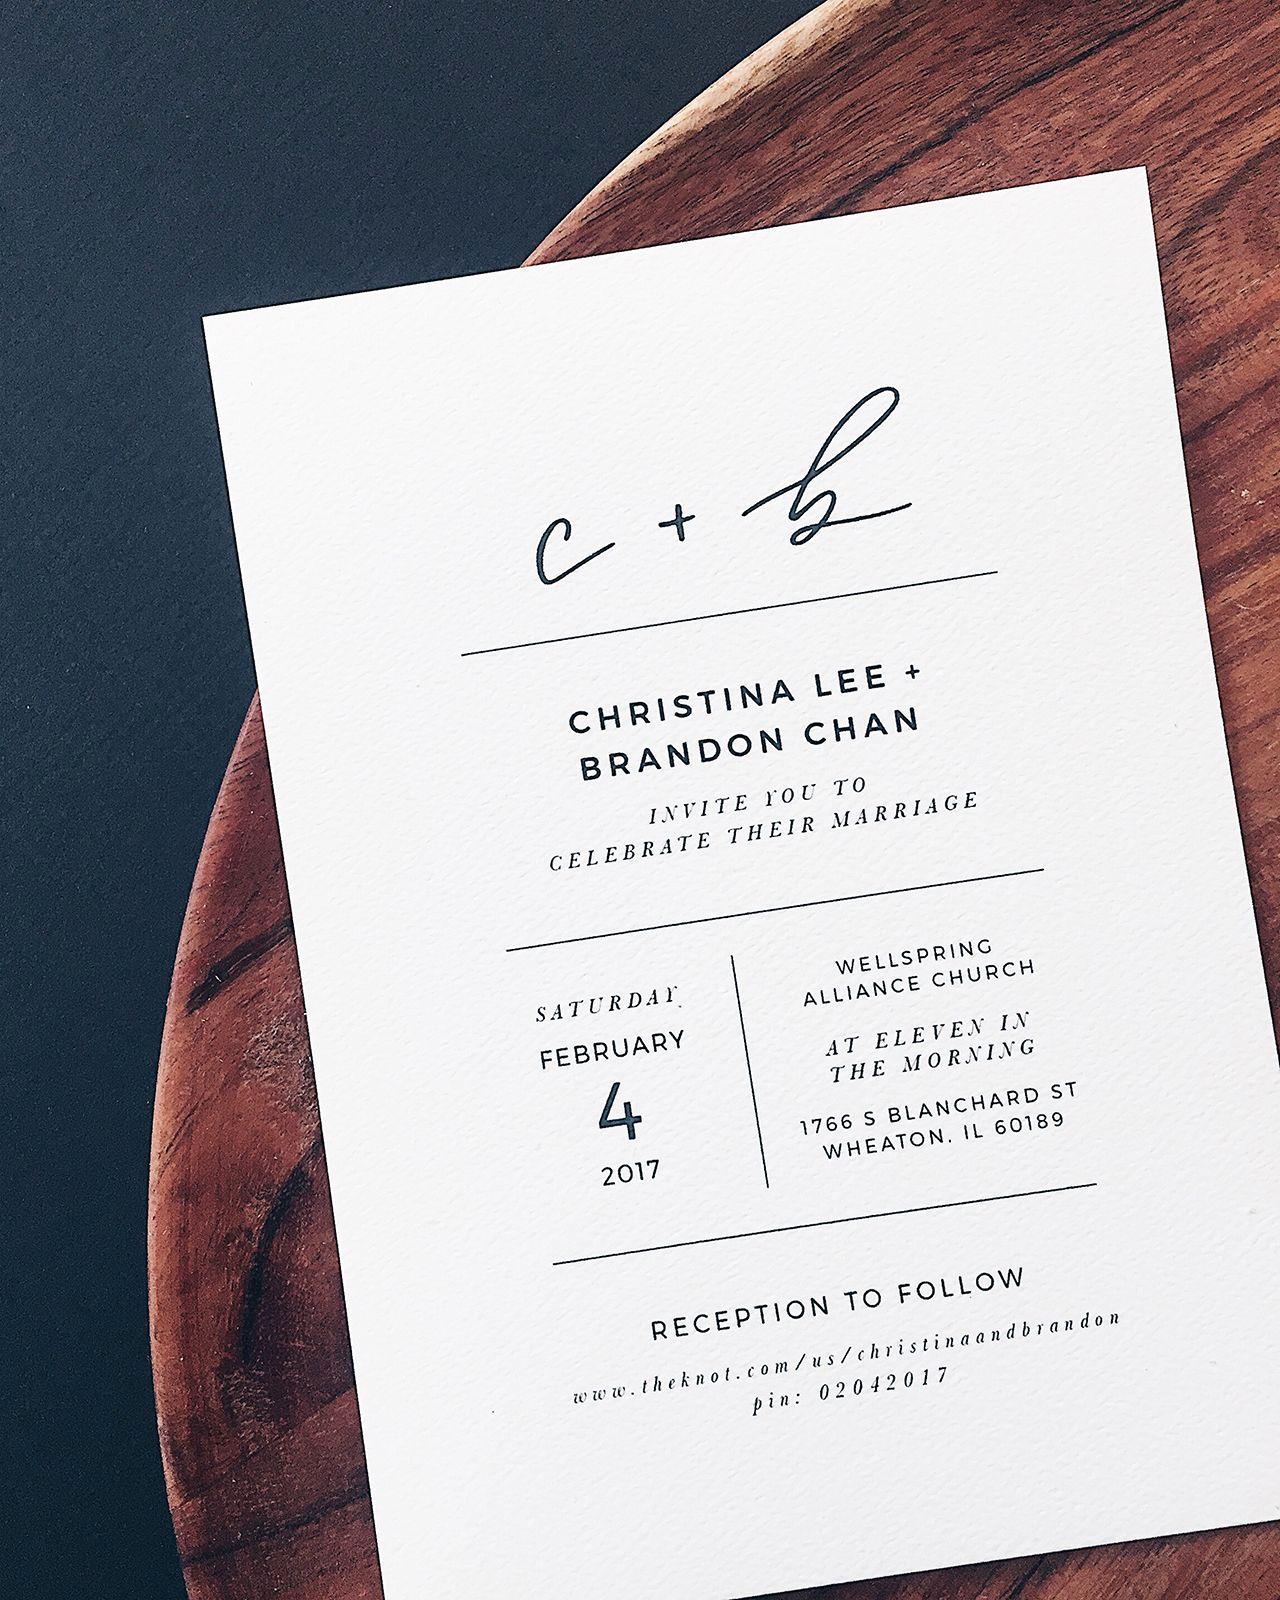 Wedding Invitation Graphic Design Best Of Minimalist Black and White Hand Lettered Wedding